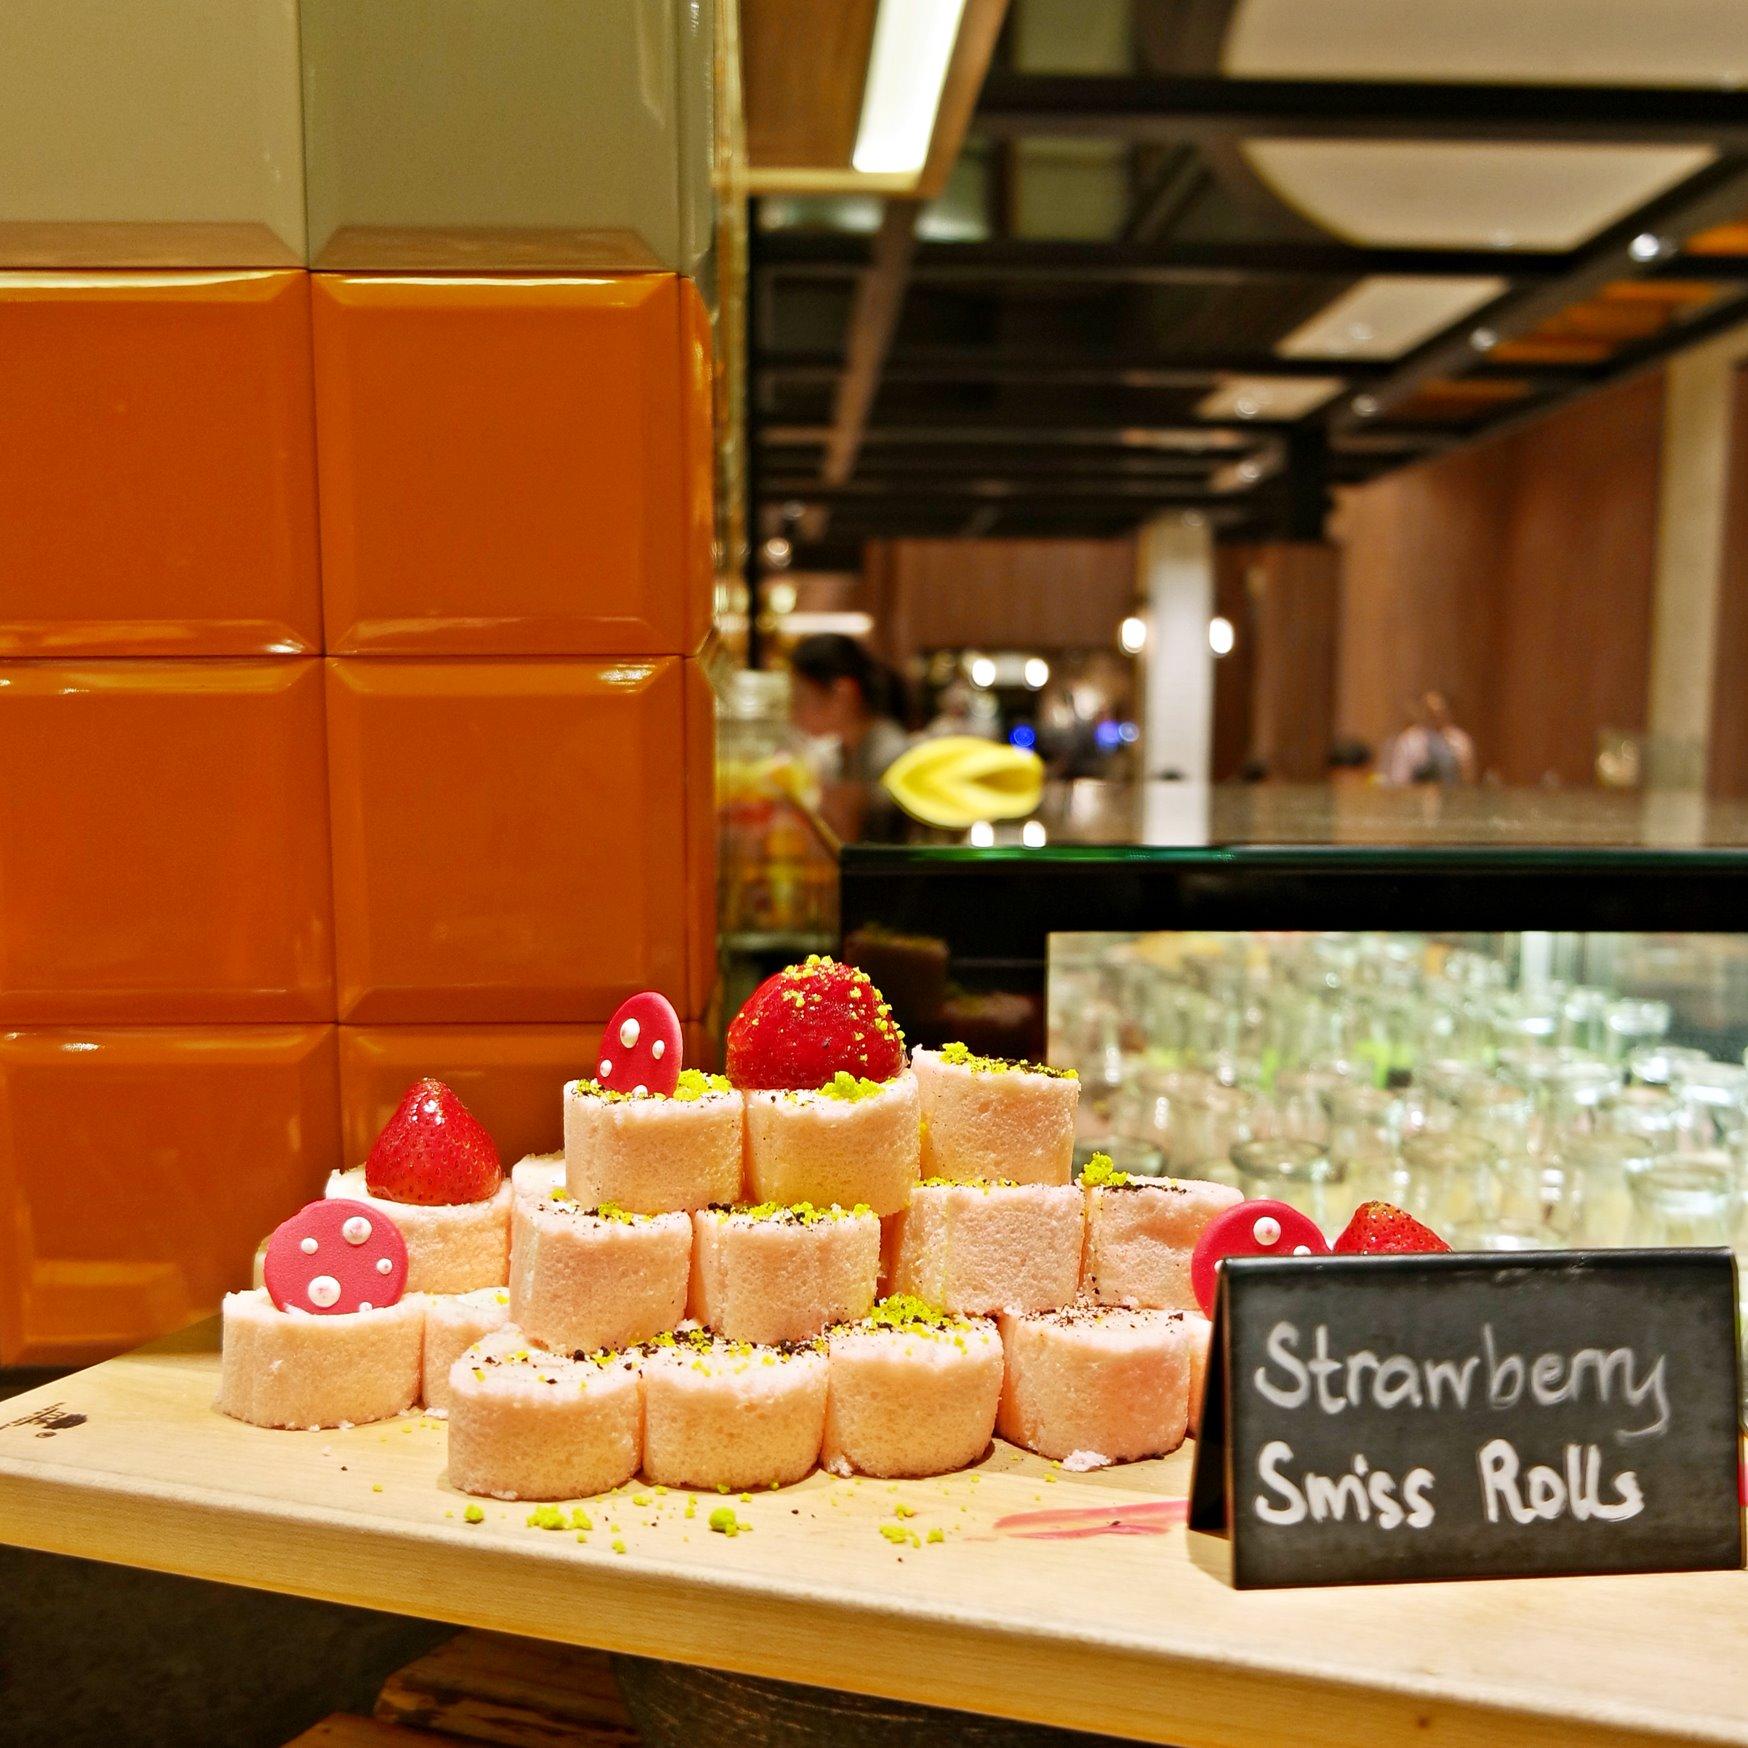 Strawberry Swiss Roll @ J65